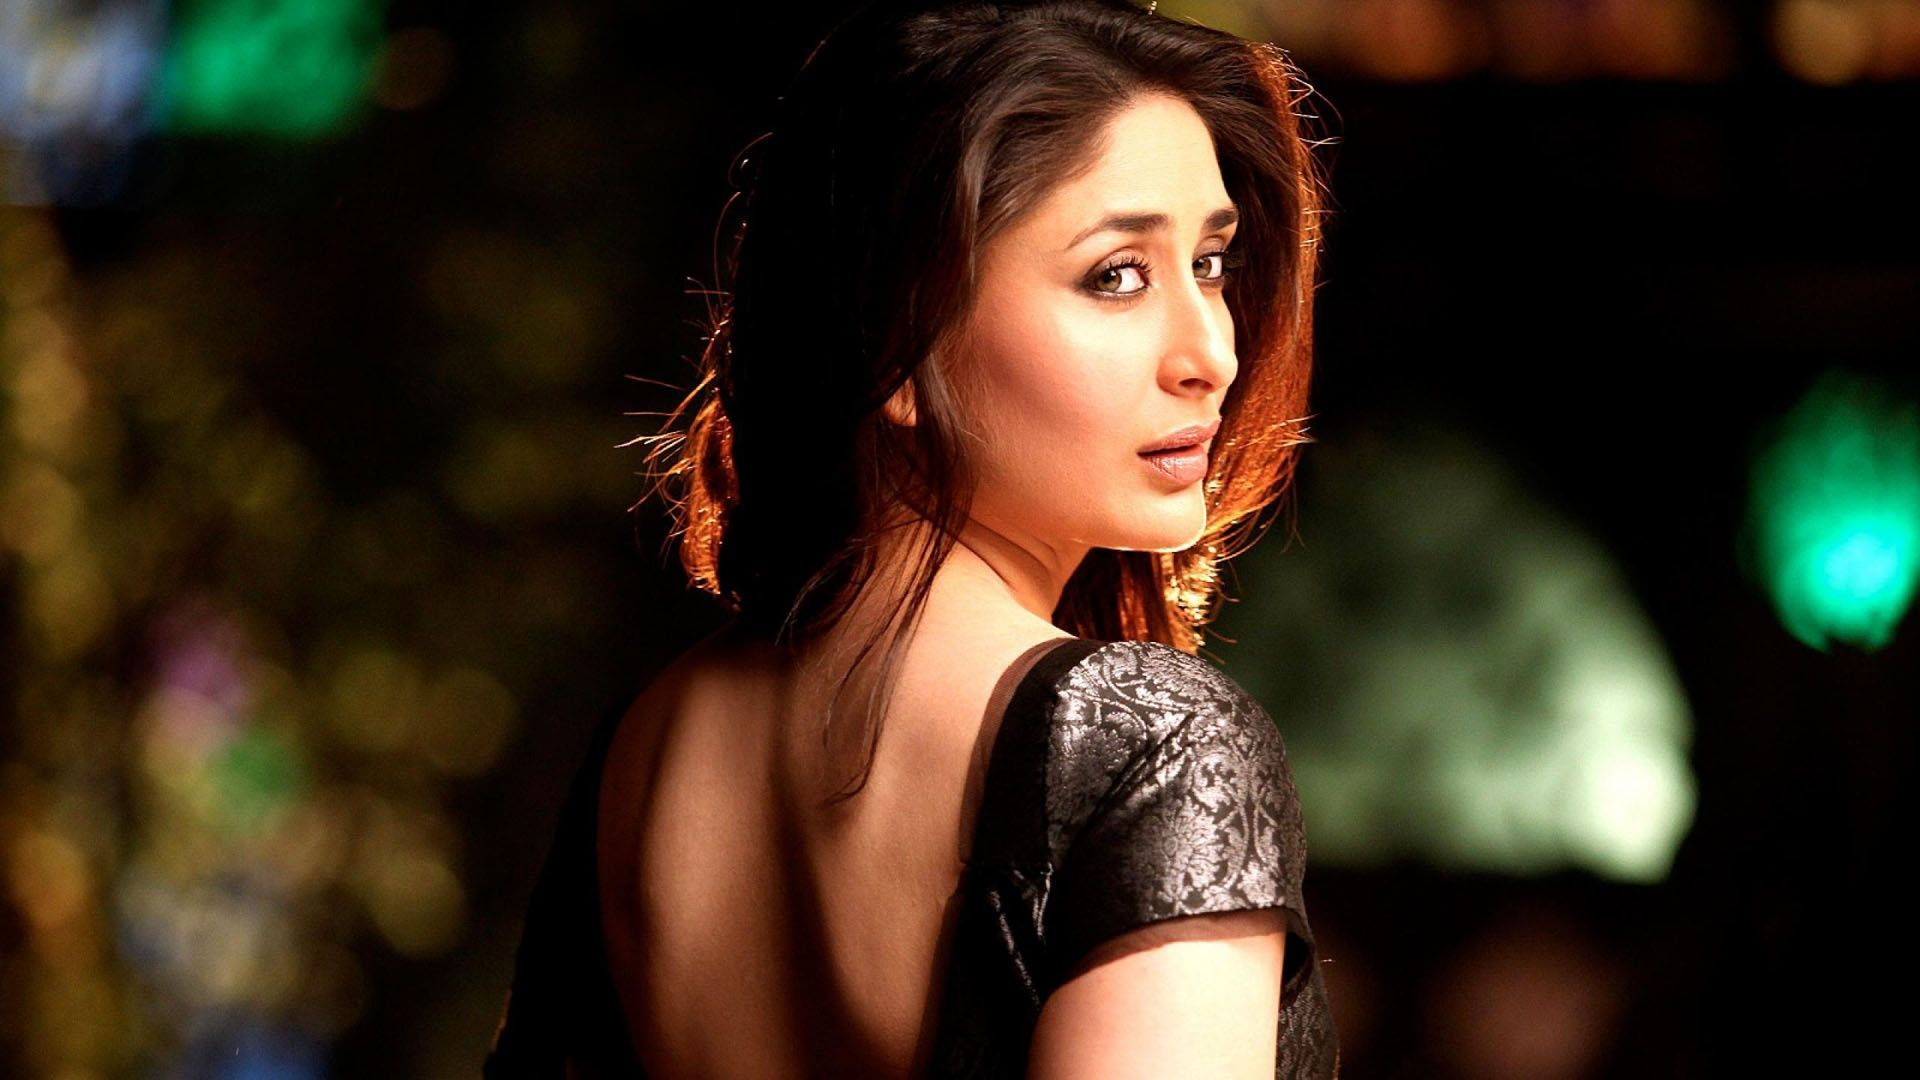 Full Hd Wallpapers Bollywood Actress Wallpaper 1920 1080: Kareena Kapoor Bollywood Actress Hd Wallpapers 3766 Full